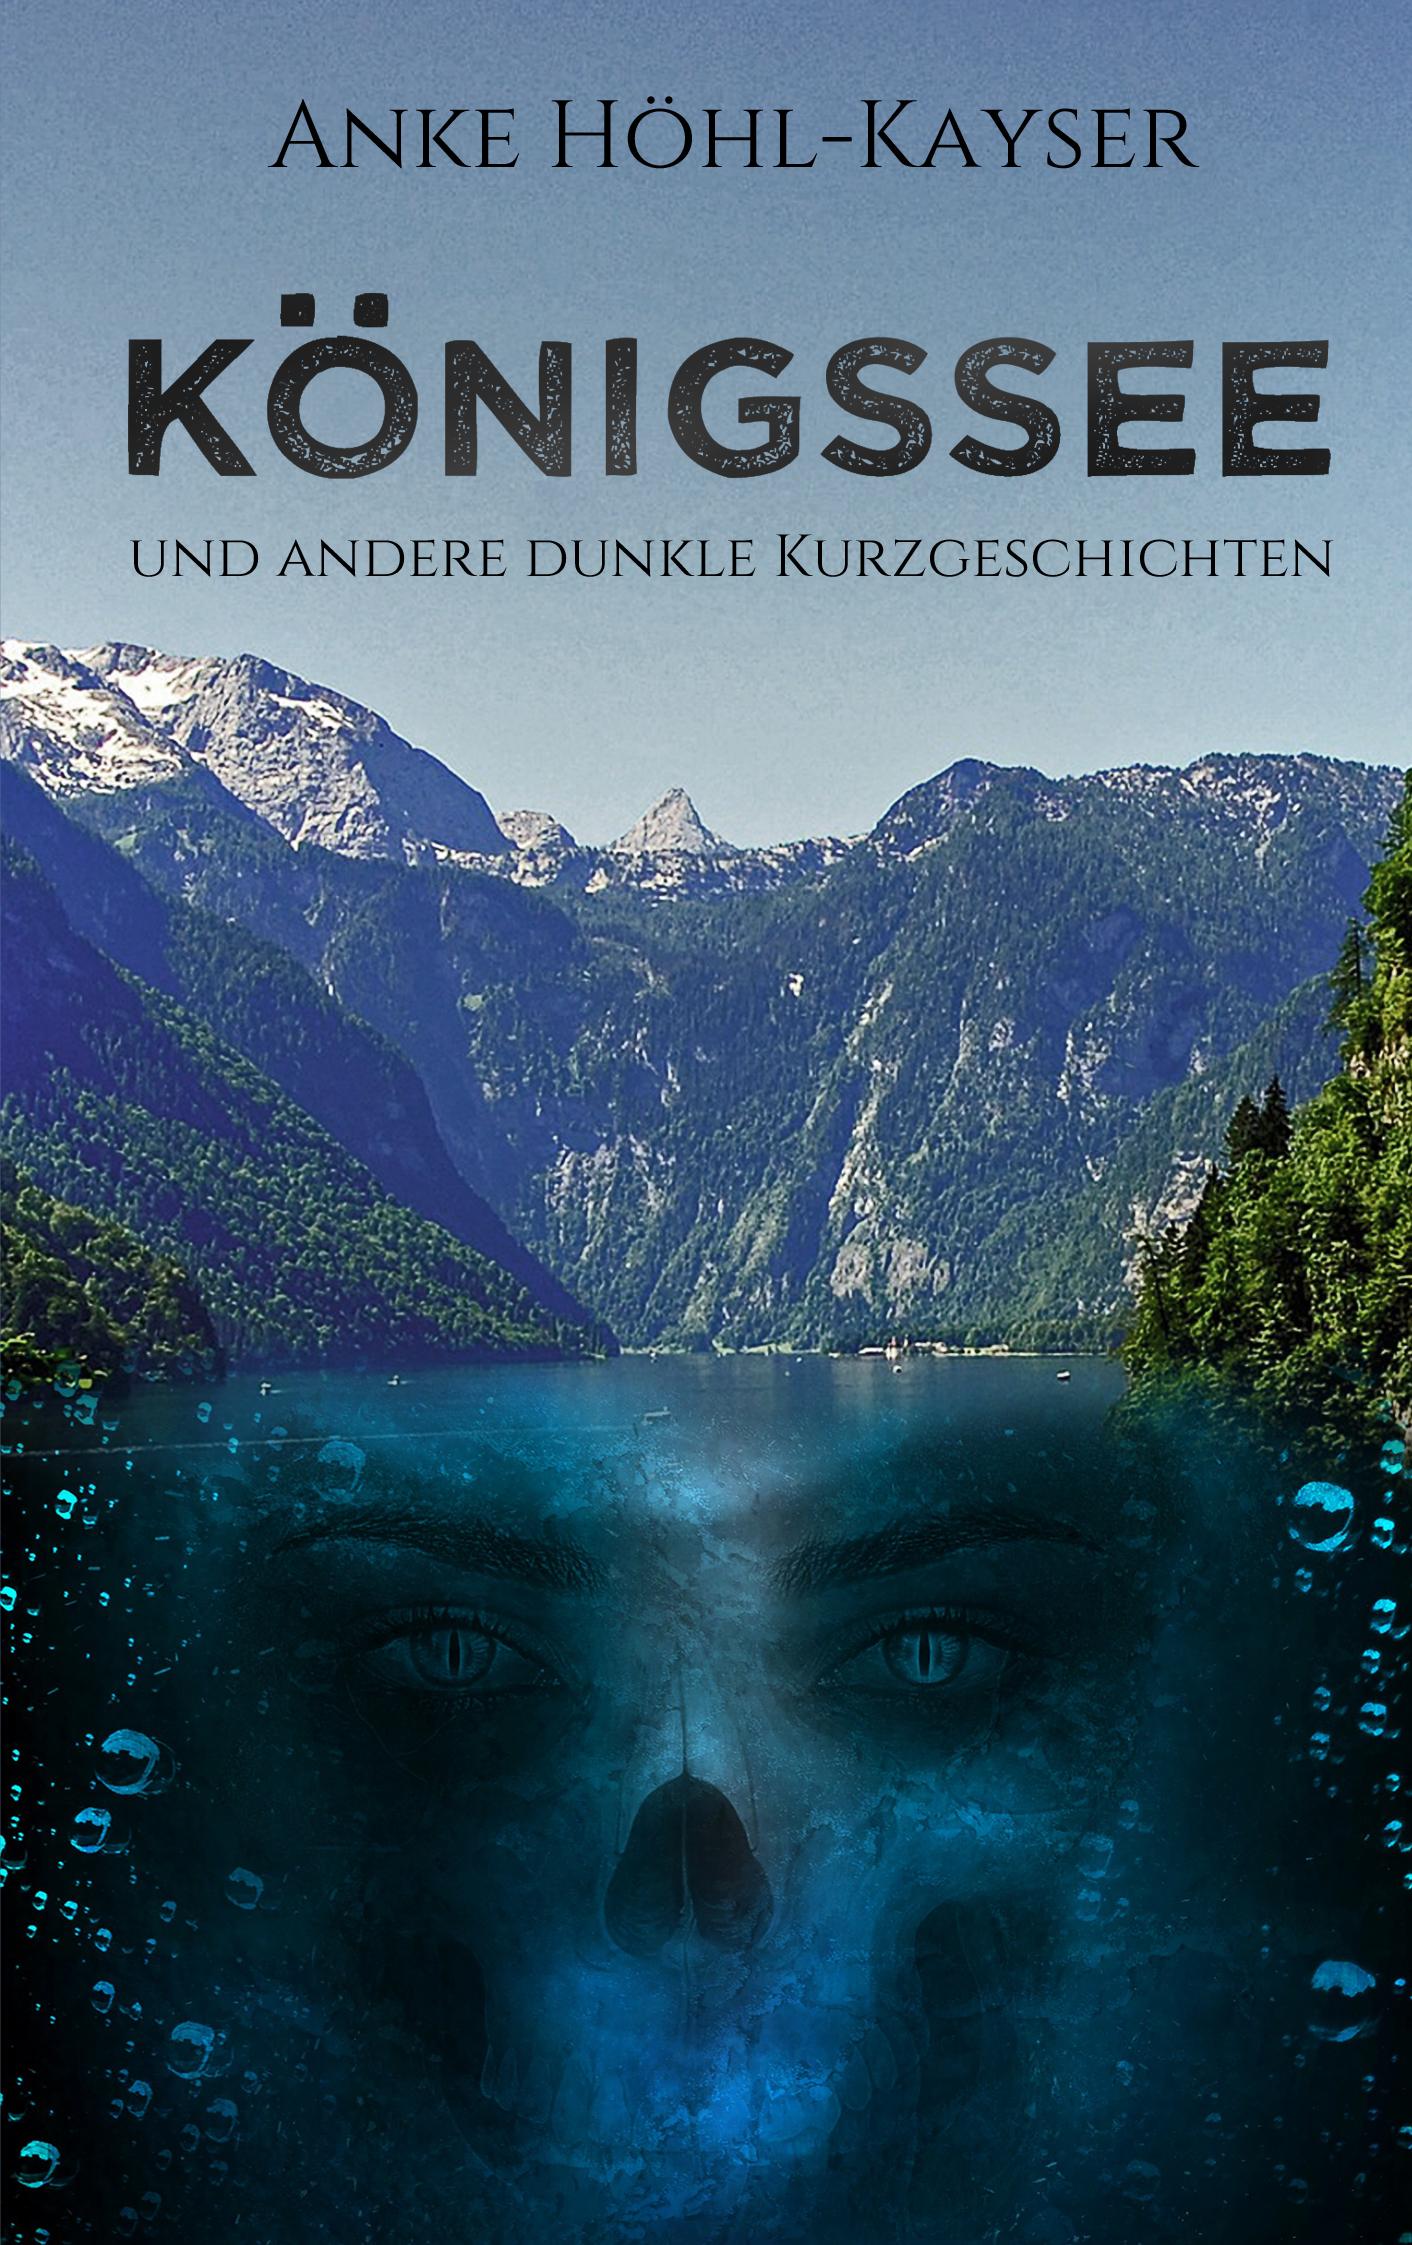 hoehl-kayser_anke__phantastik-autoren-netzwerk.jpg